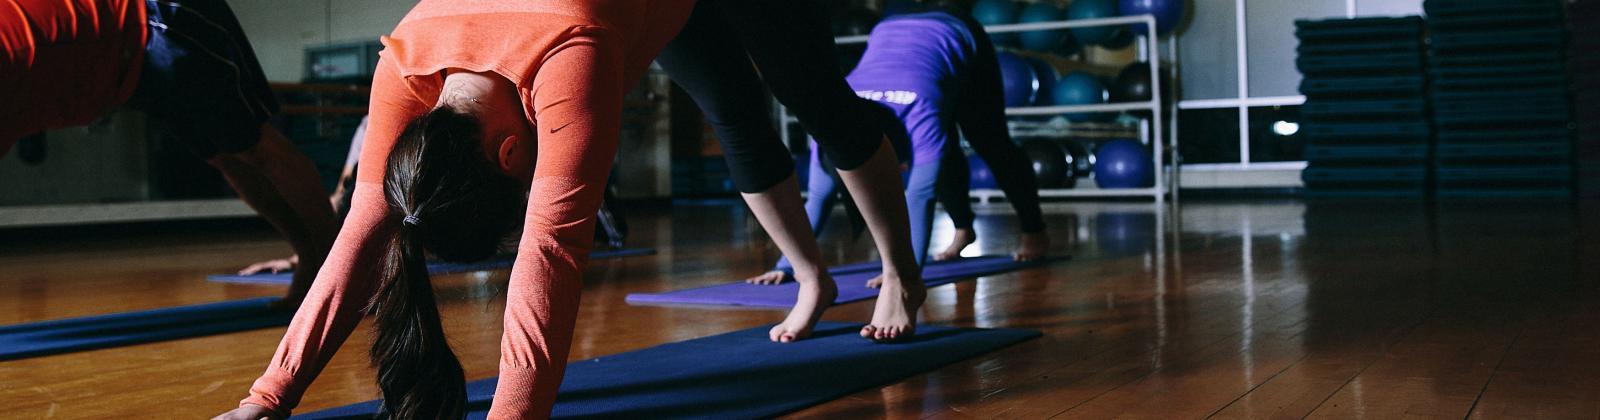 new habits - yoga